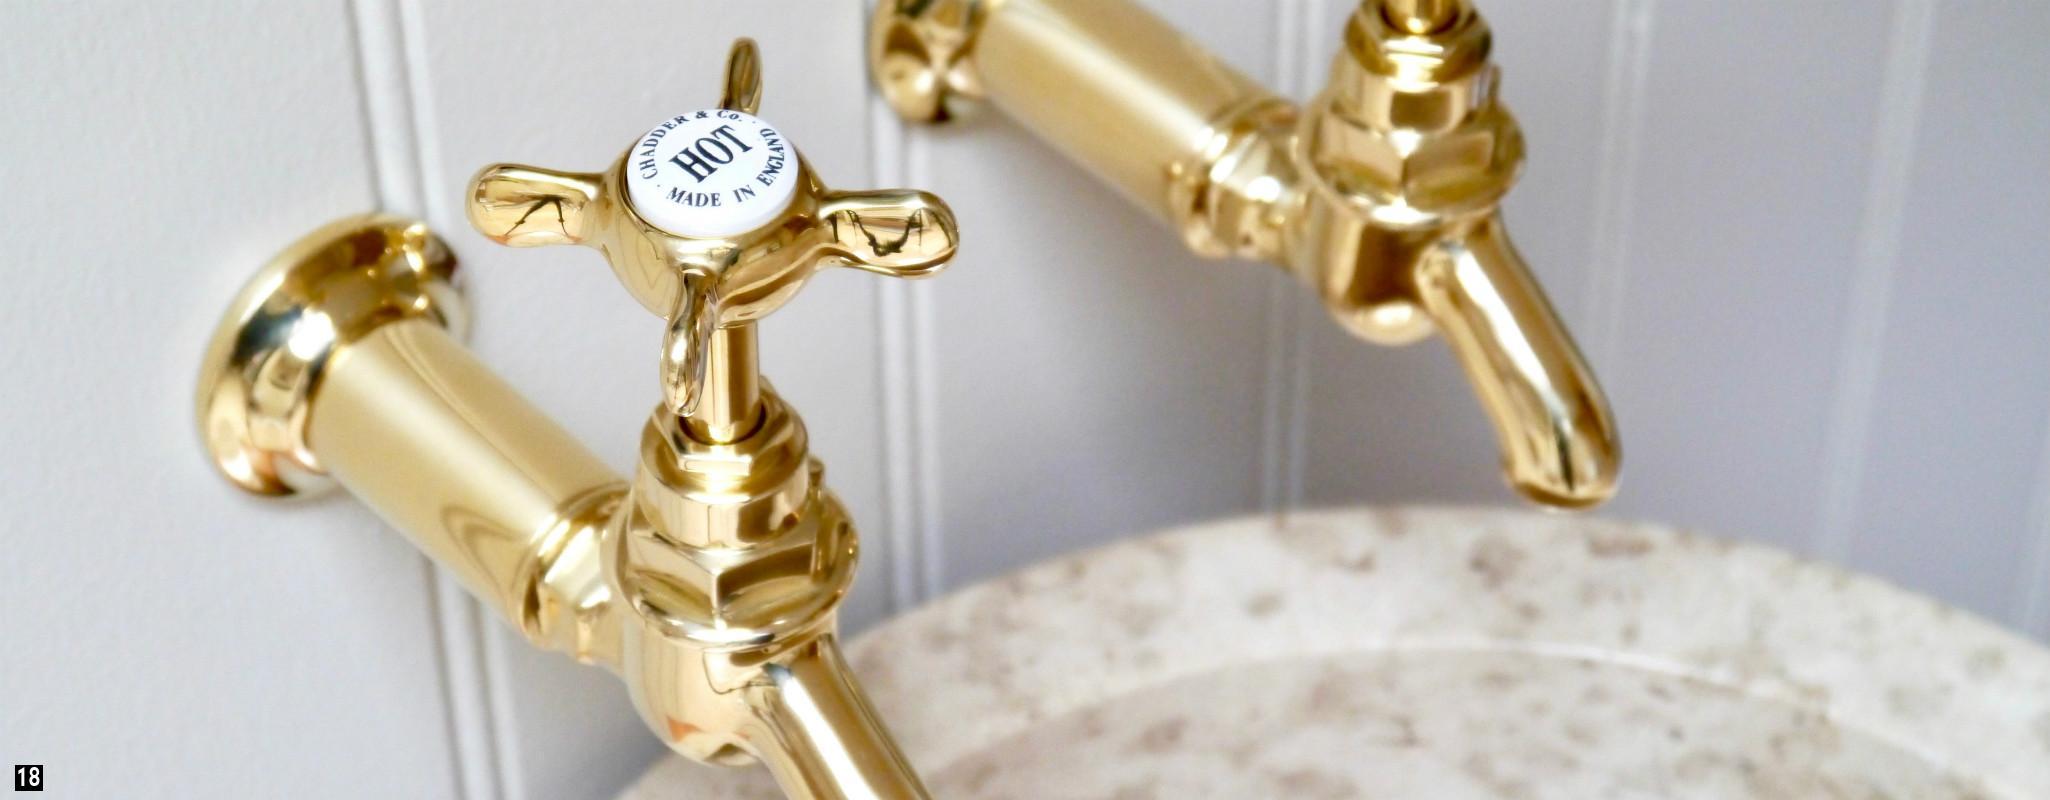 Brass bathroom fittings - Brass Taps Brass Kitchen Taps Brass Bib Taps Vintage Brass Bath Taps